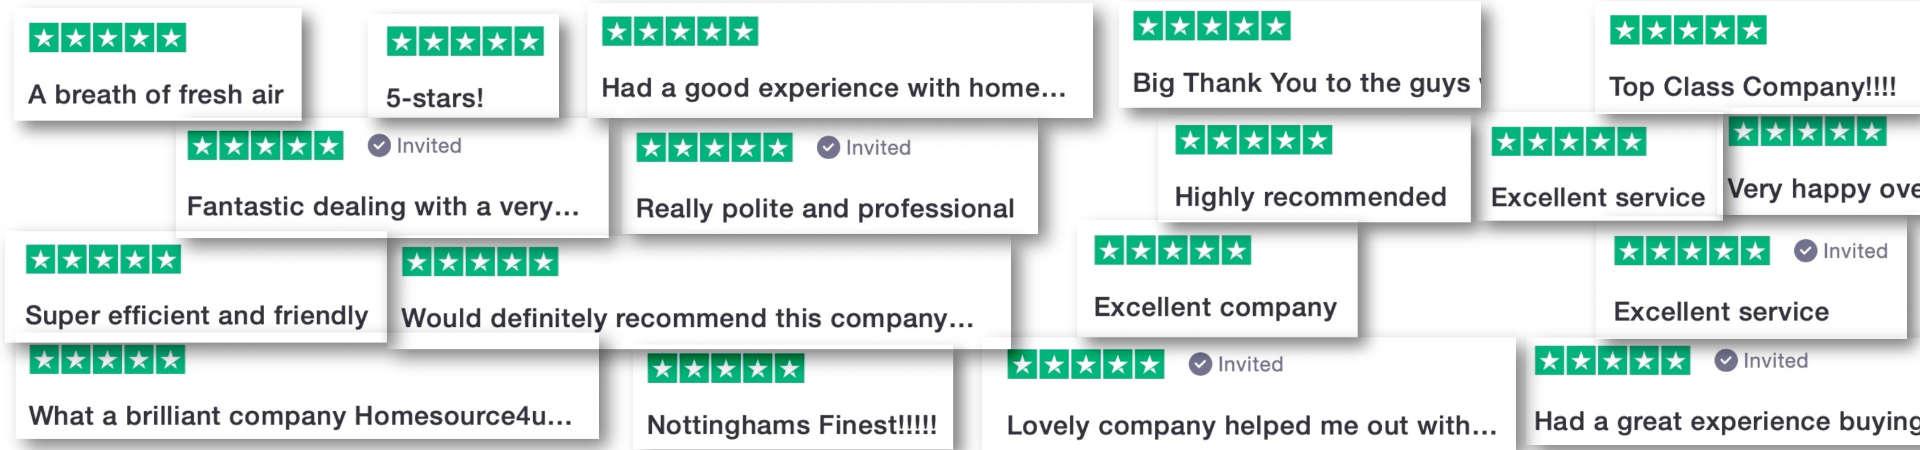 Reviews of Homesource 4U